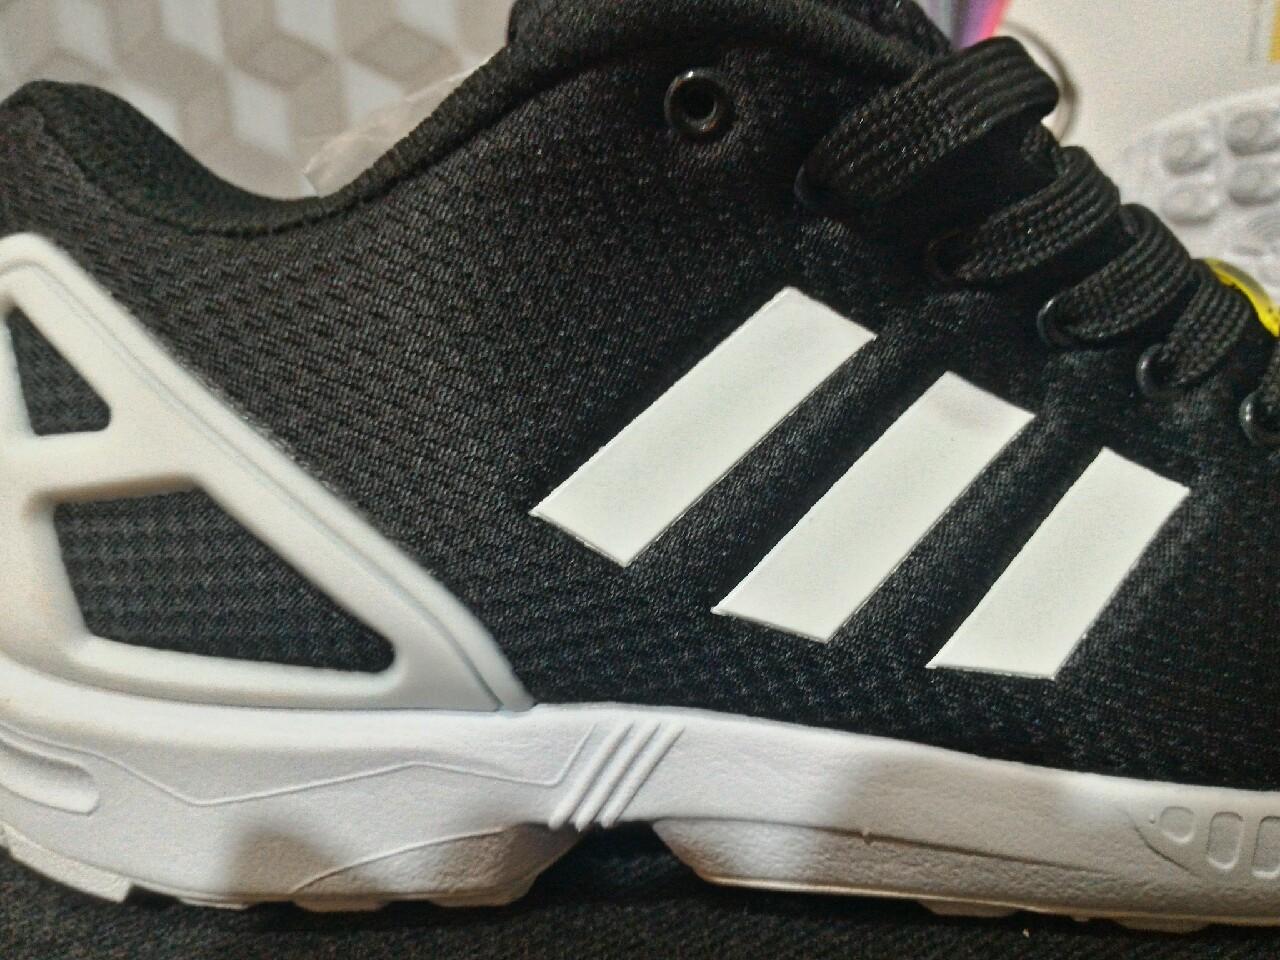 68e0ec194b912 ... purchase jual adidas zx flux xeno original sepatu adidas zx flux 83a80  ad7f1